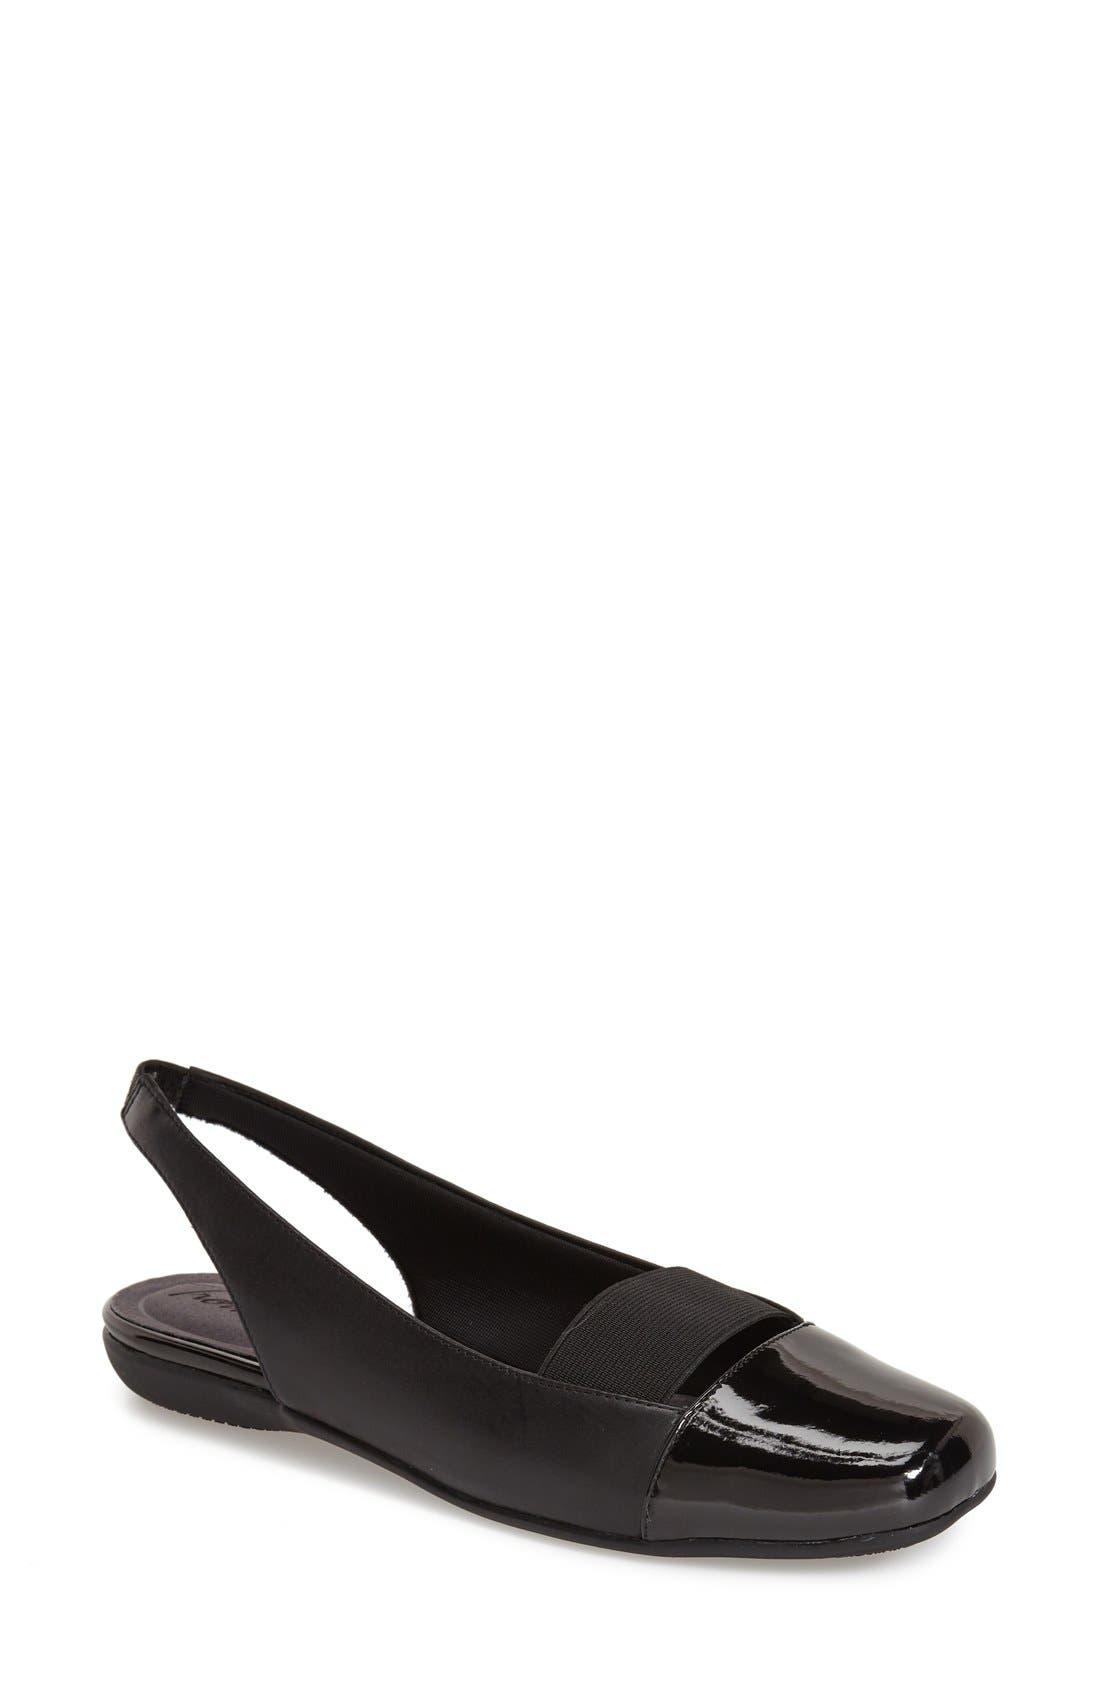 'Sarina' SlingbackFlat,                         Main,                         color, Black Leather